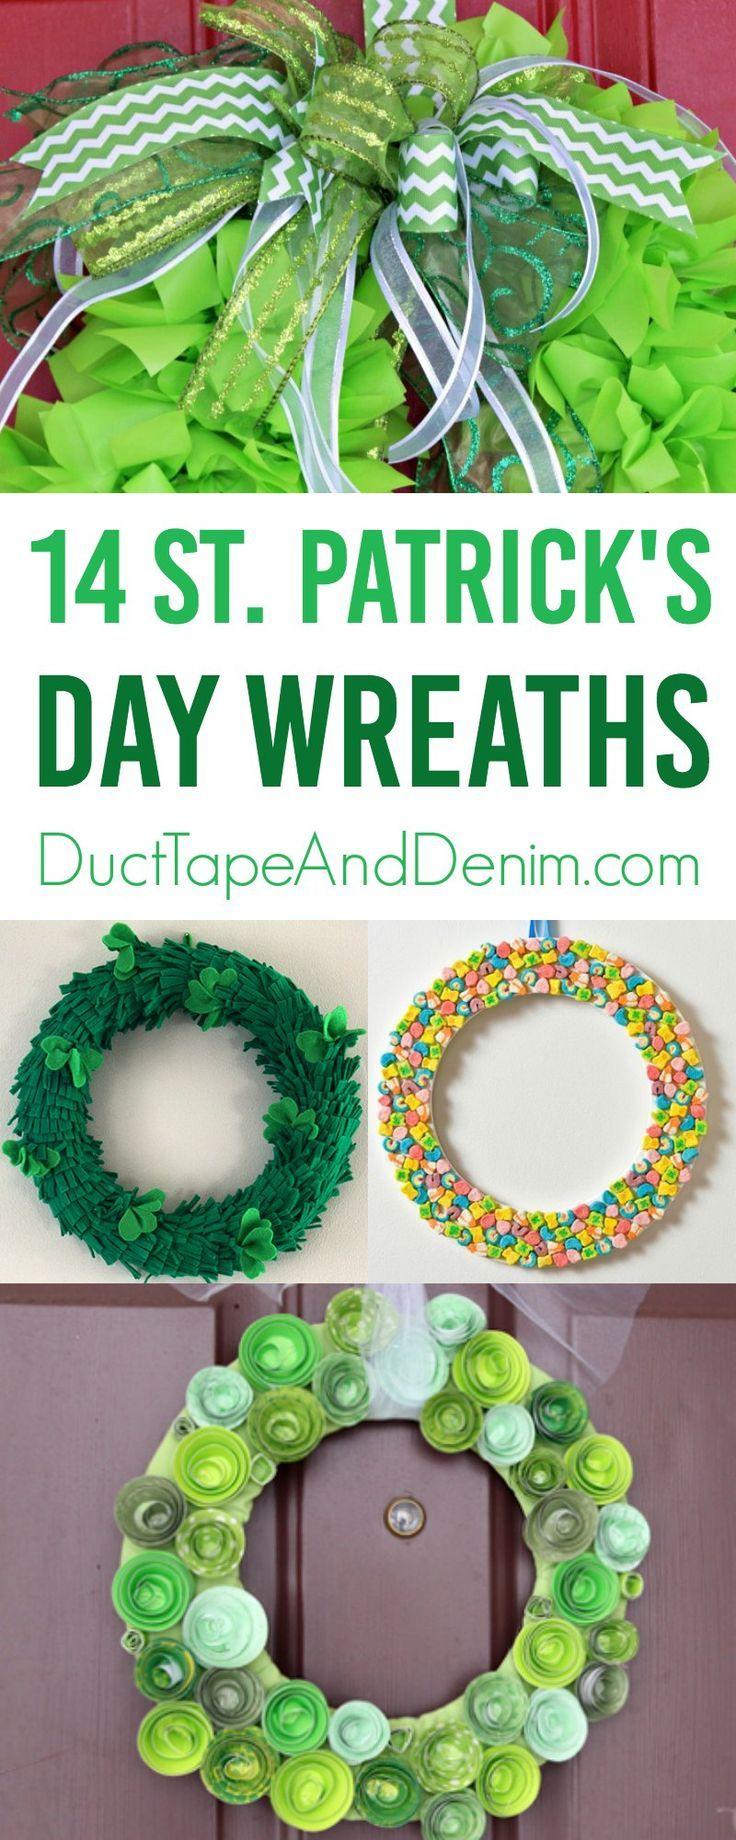 14 St Patrick's Day Wreath ideas to make on DuctTapeAndDenim.com #stpatricksday #stpaddysday #stpatricks #wreath #wreaths #DIYwreath #DIYwreaths #wreathideas #frontdoordecor #holidaywreath #craft #homedecor #DIYhome #diyhomedecor